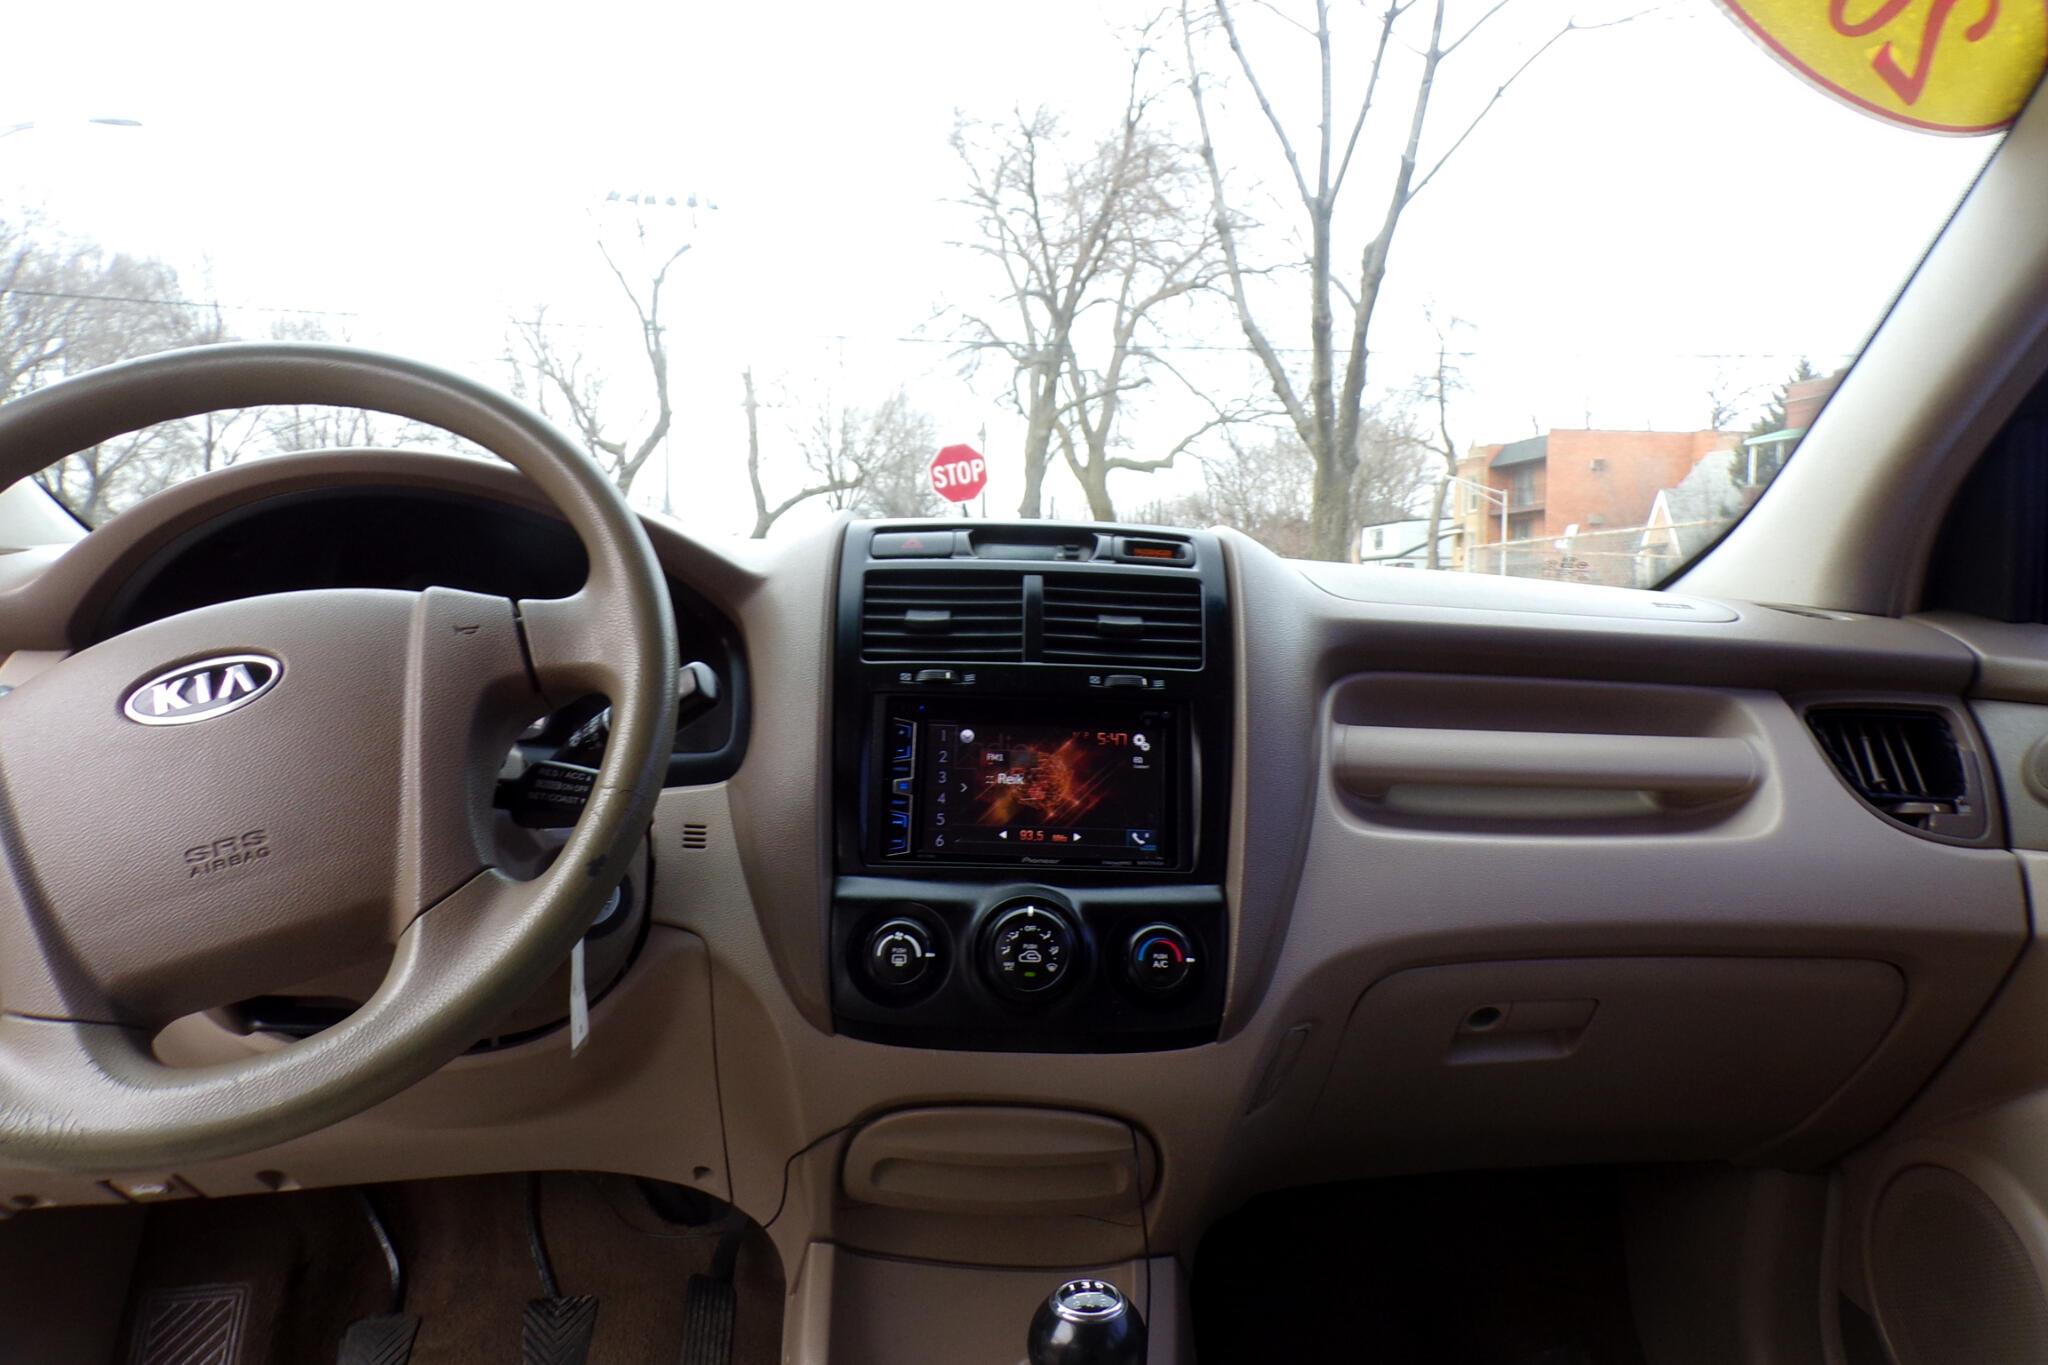 2007 Kia Sportage 2WD 4dr I4 Manual LX